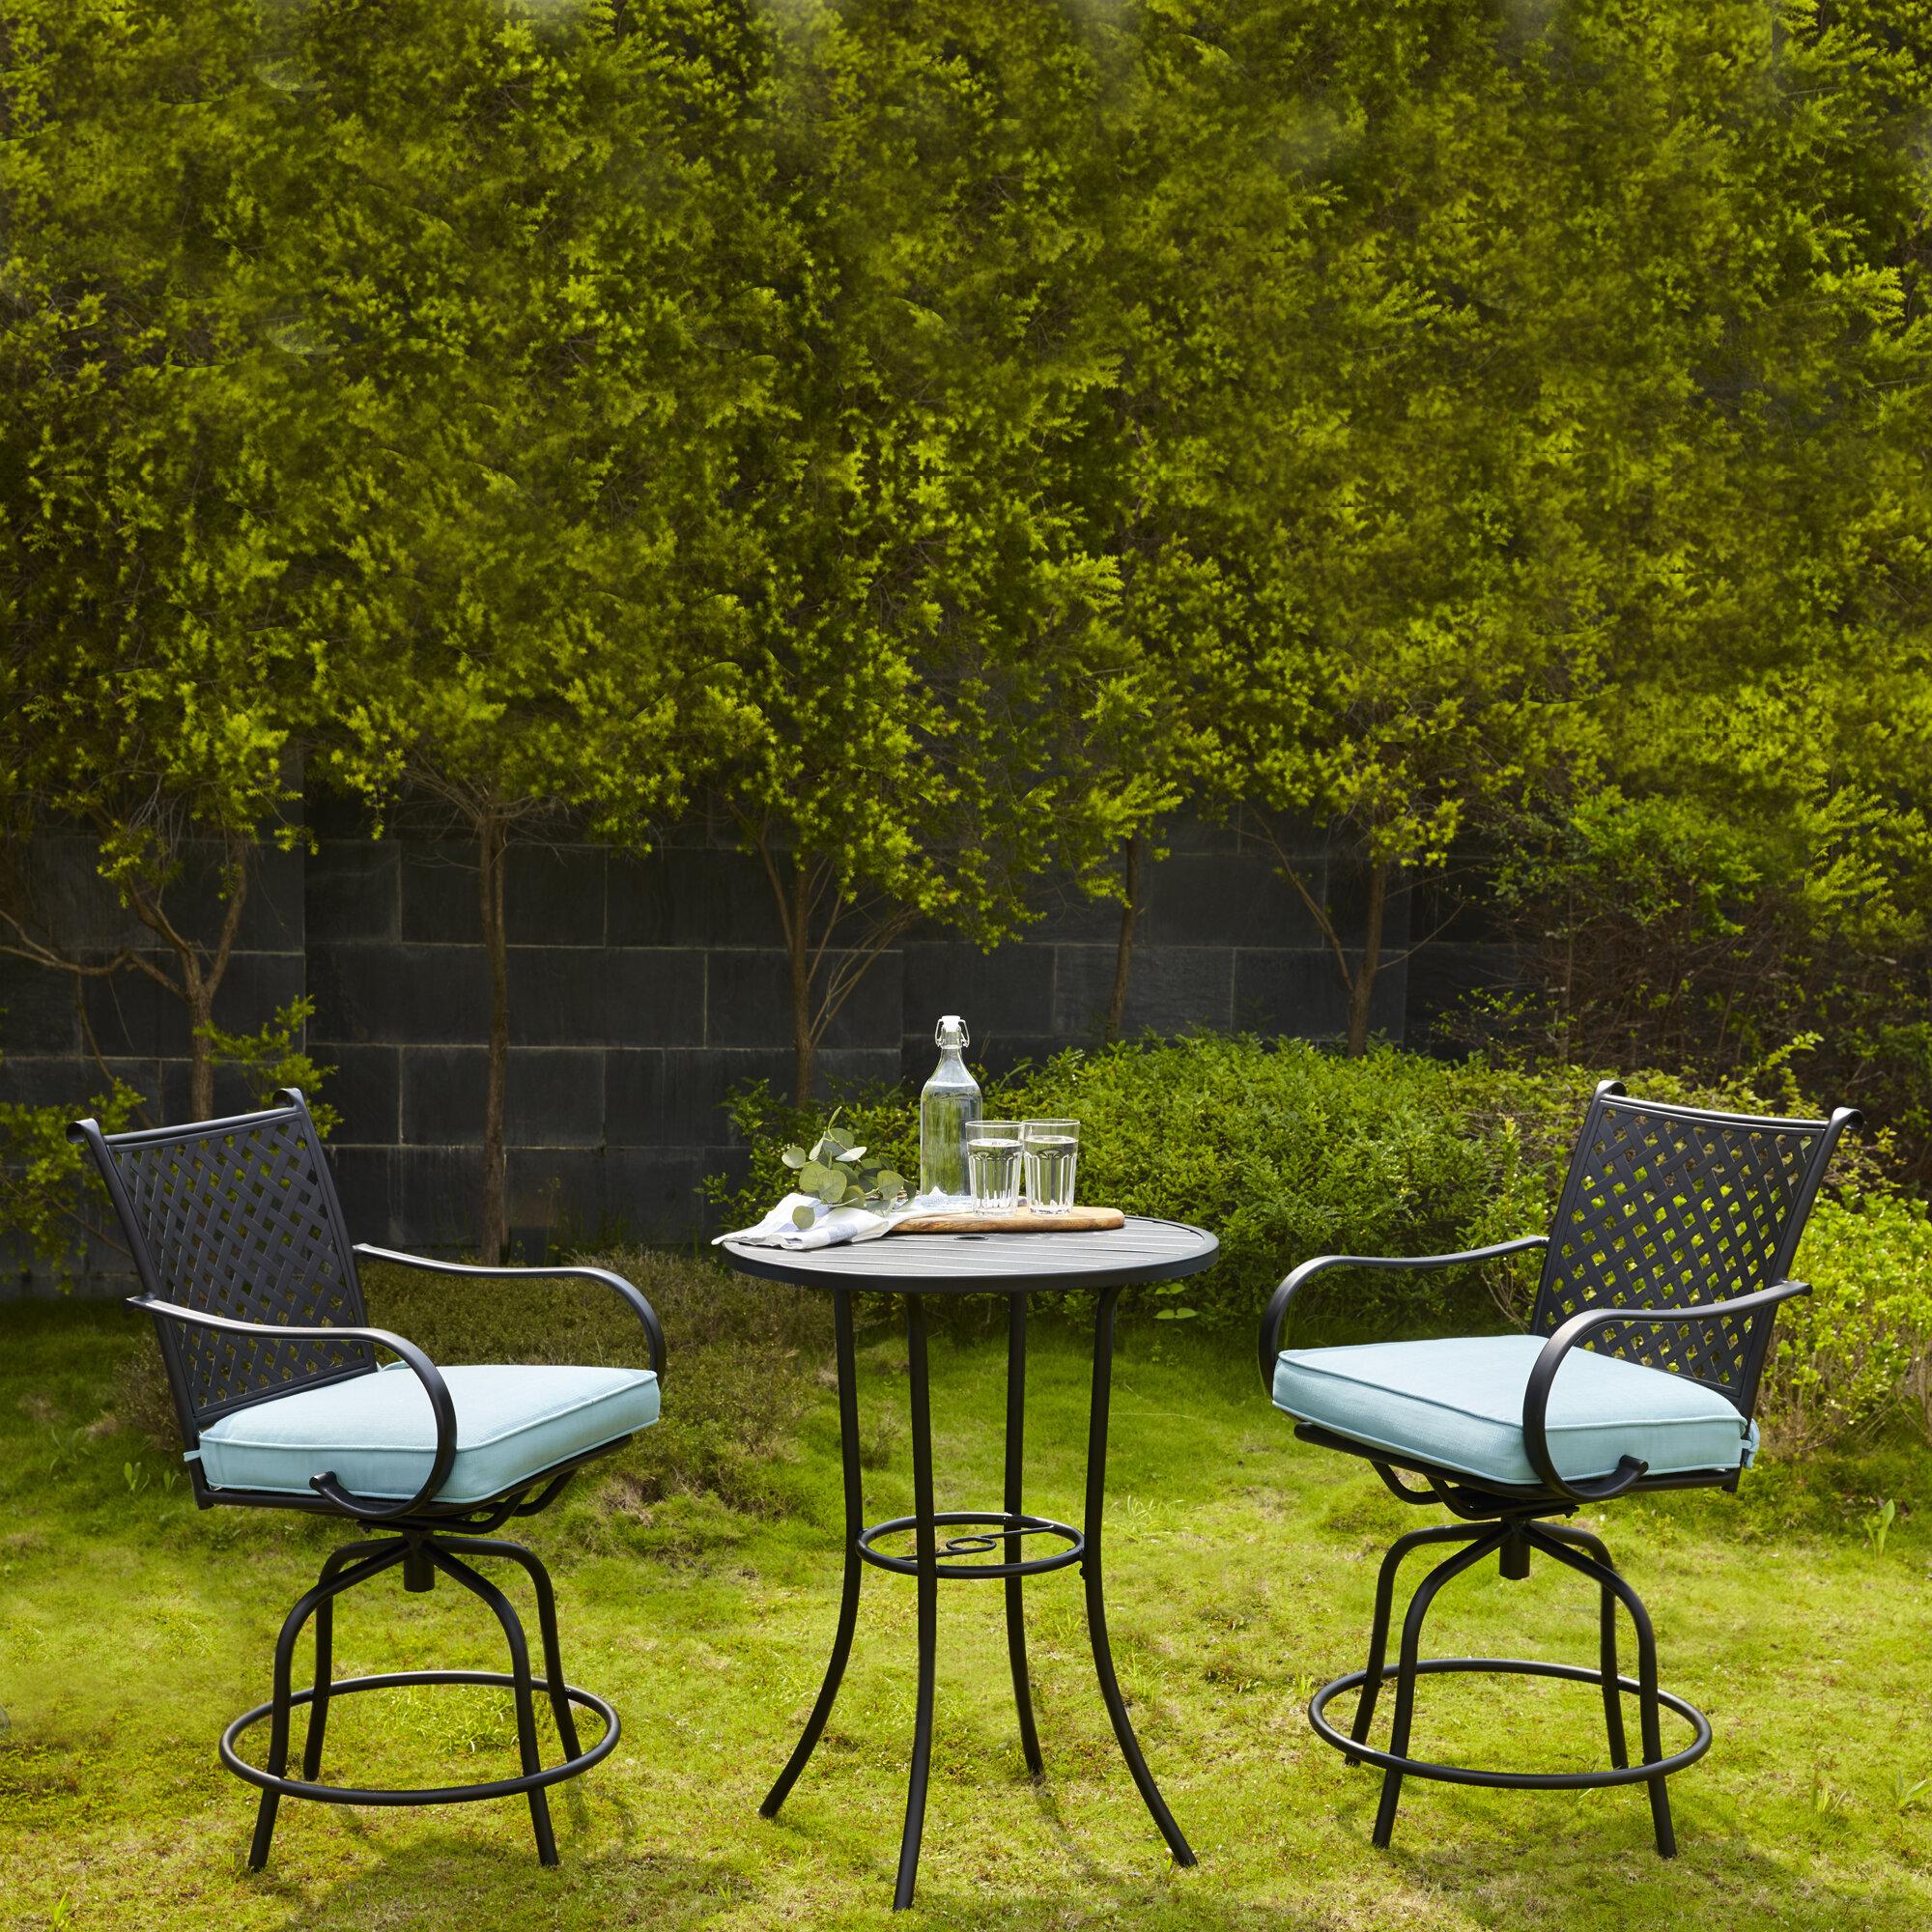 Ebern Designs Trentin Patio Swivel 3 Piece Bar Height Dining Set